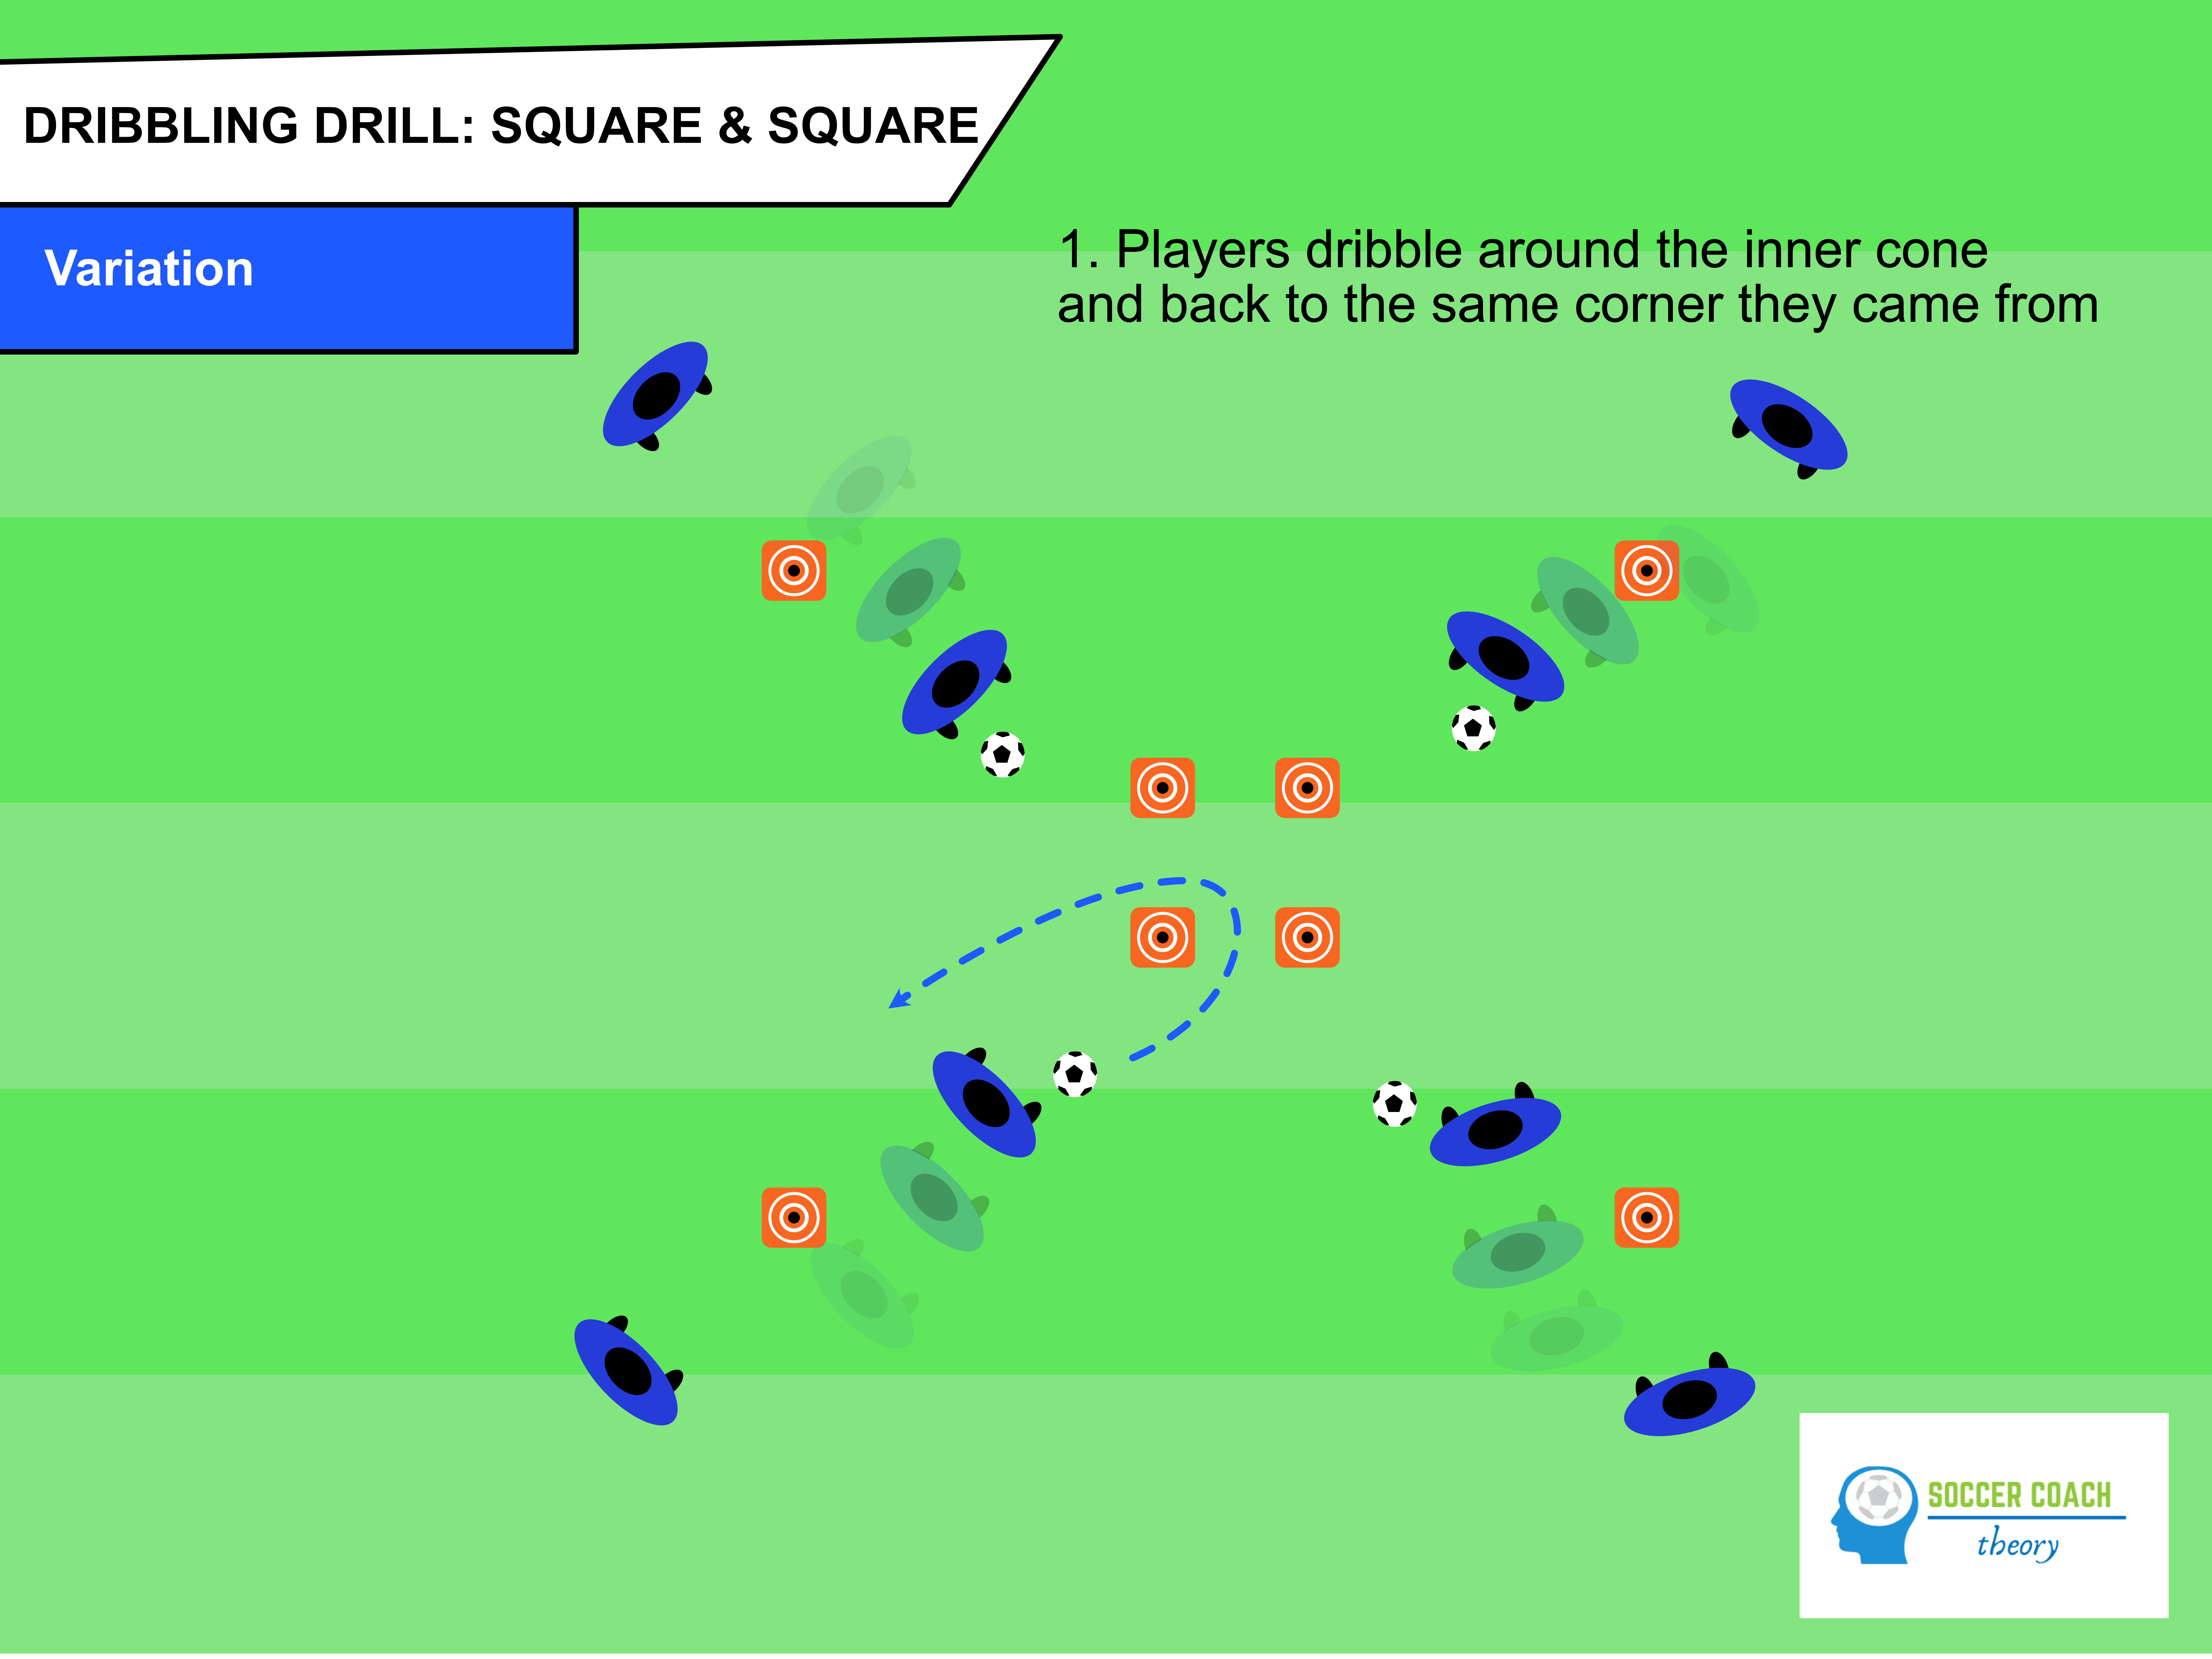 Soccer dribbling drill: square & square - variation